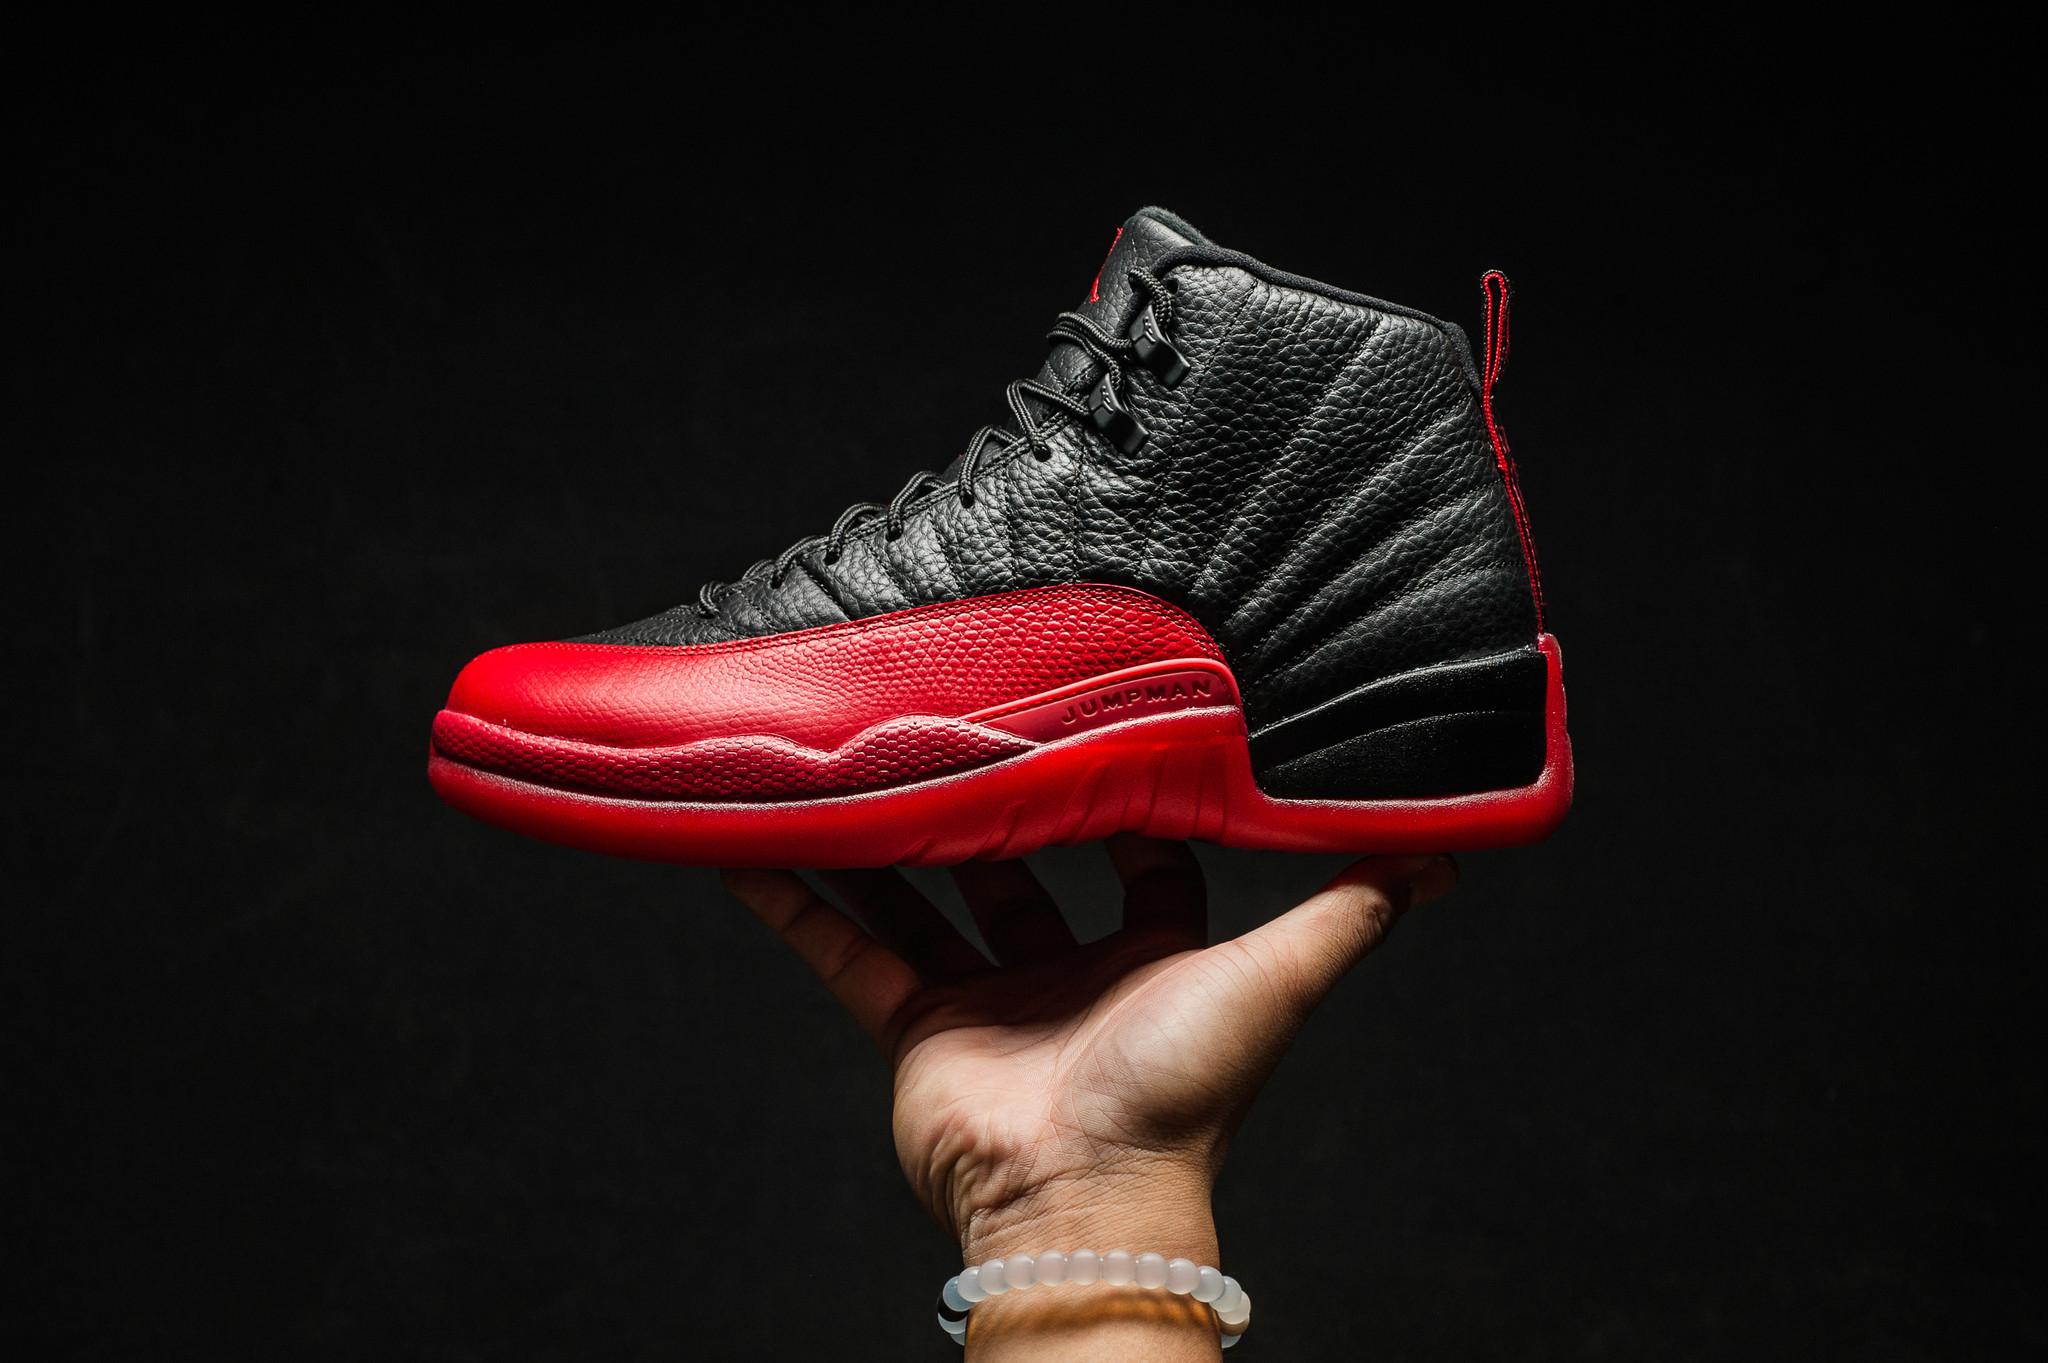 97ebd692a7e air jordan xii flu game. Air Jordan 12 (XII) Retro Color: Black/Varsity Red